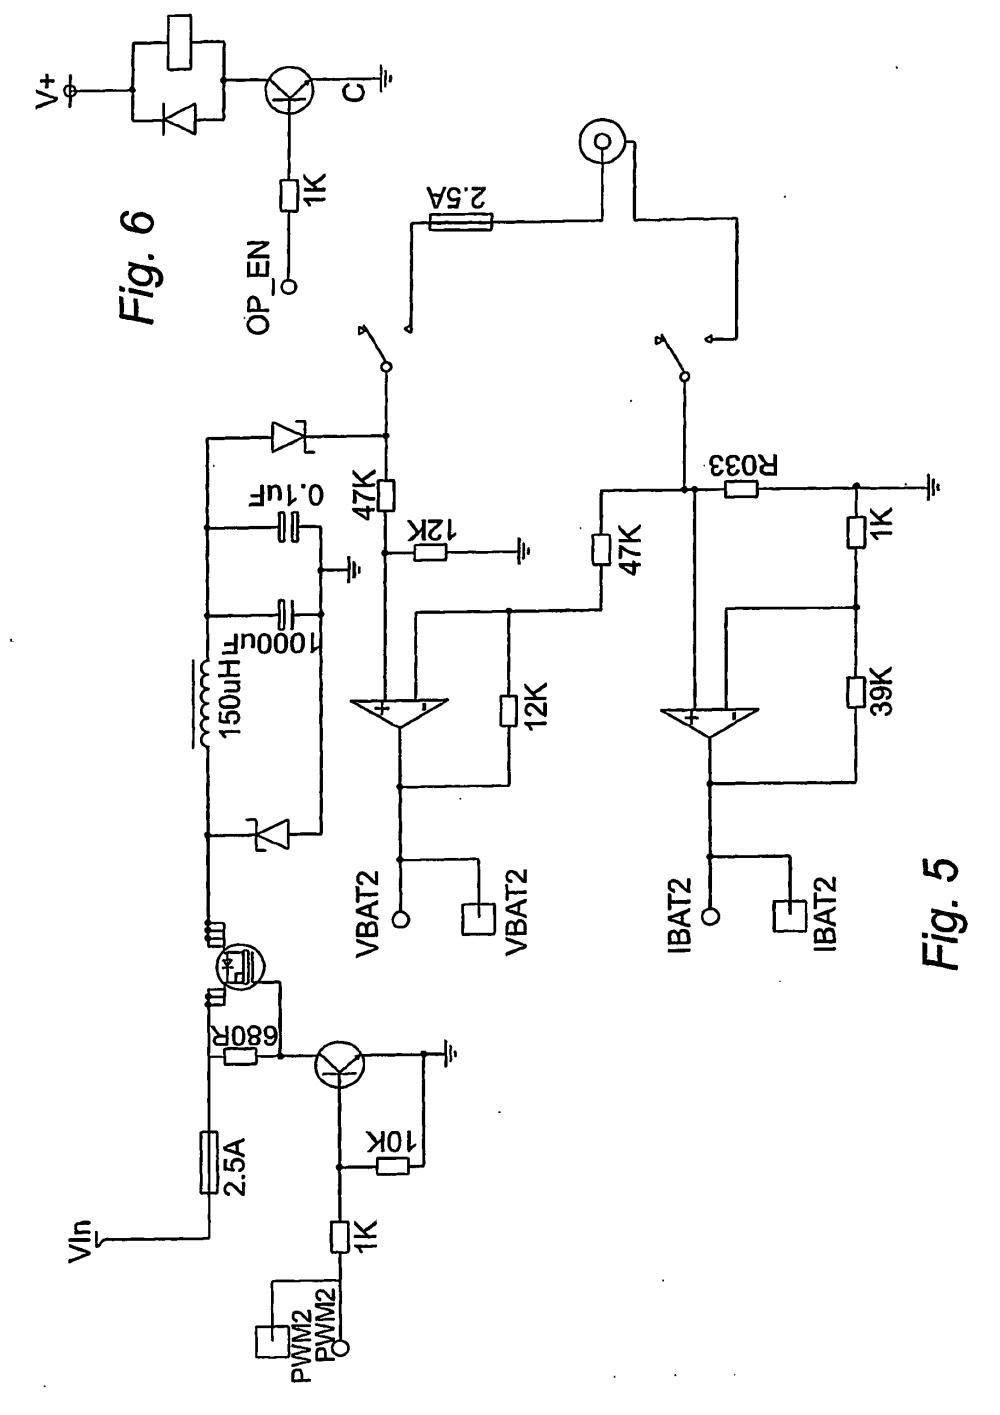 medium resolution of powakaddy wiring diagram lynx wiring diagram elsavadorla automotive wiring diagram symbol meanings vehicle wiring diagram legend